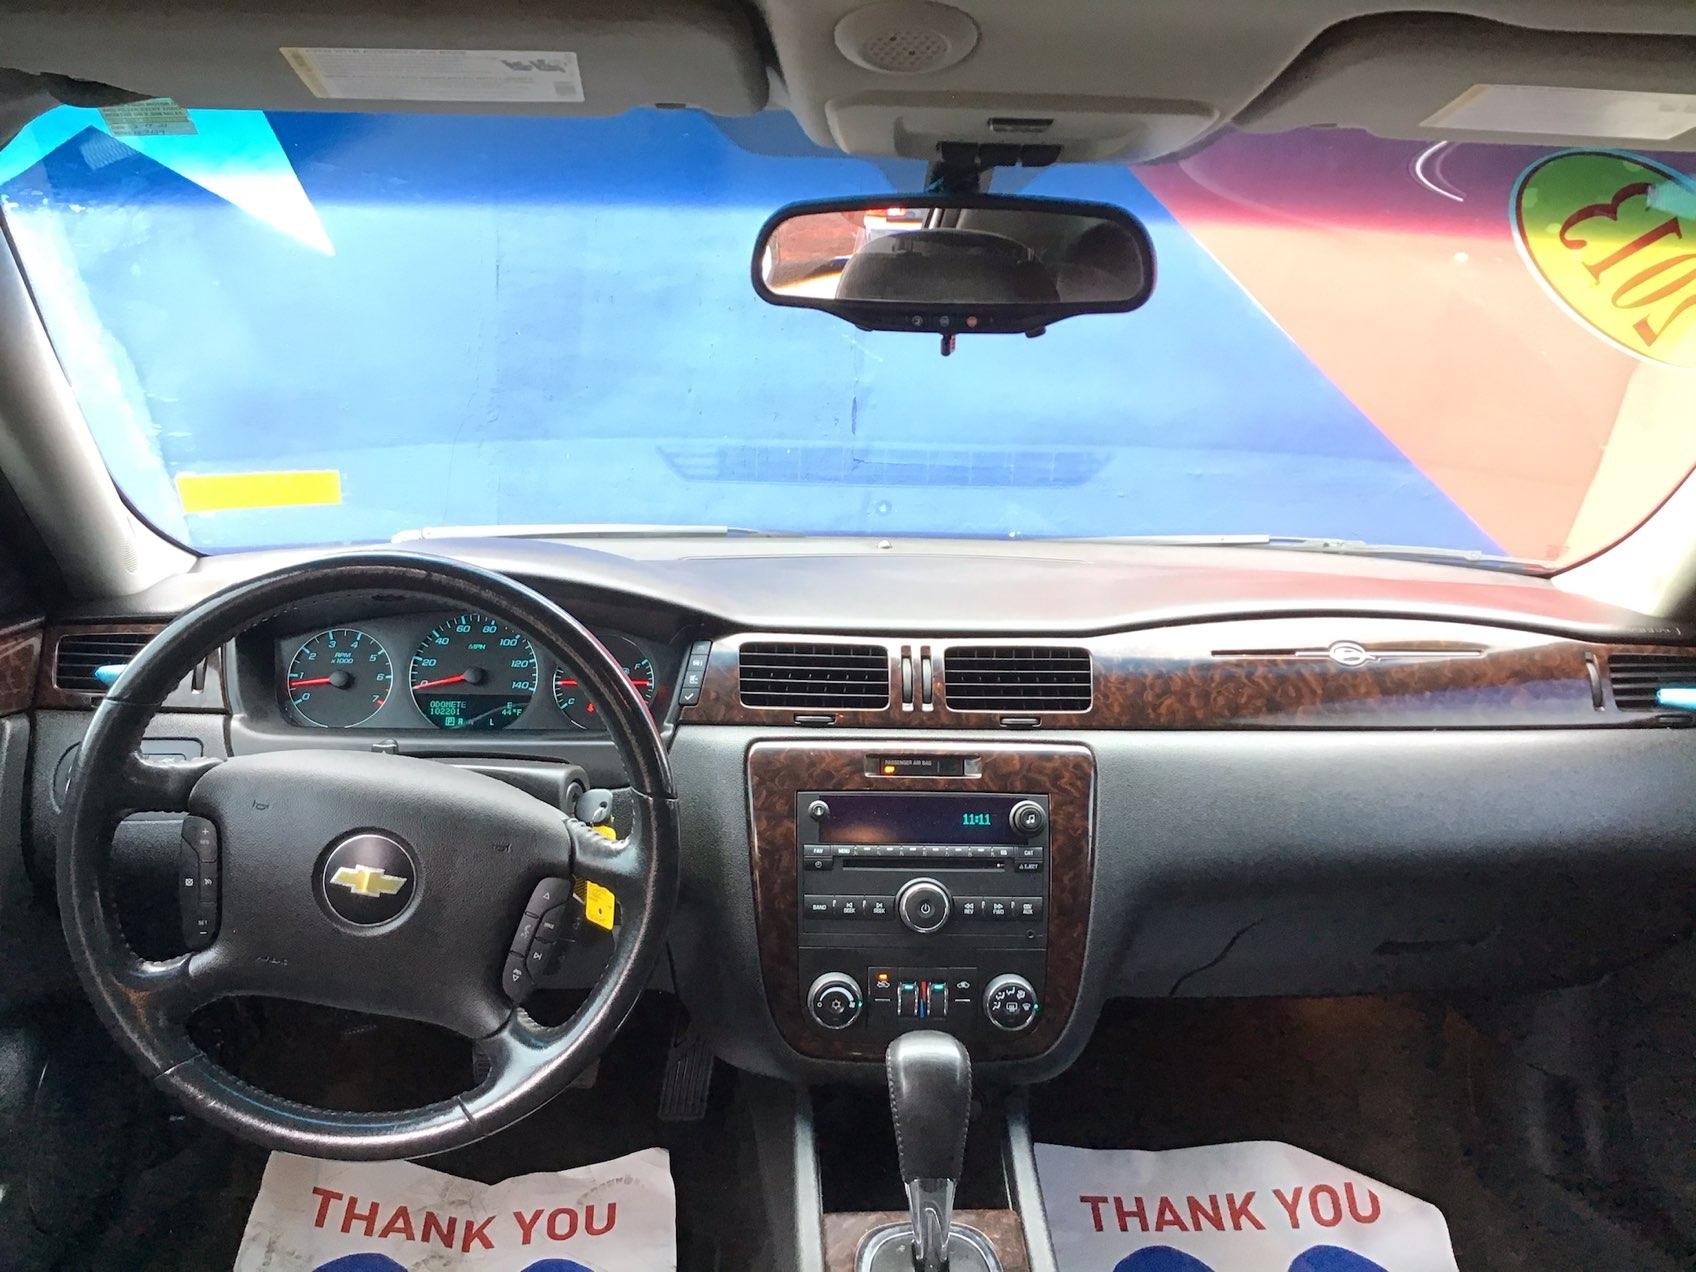 used vehicle - Sedan CHEVROLET IMPALA 2013